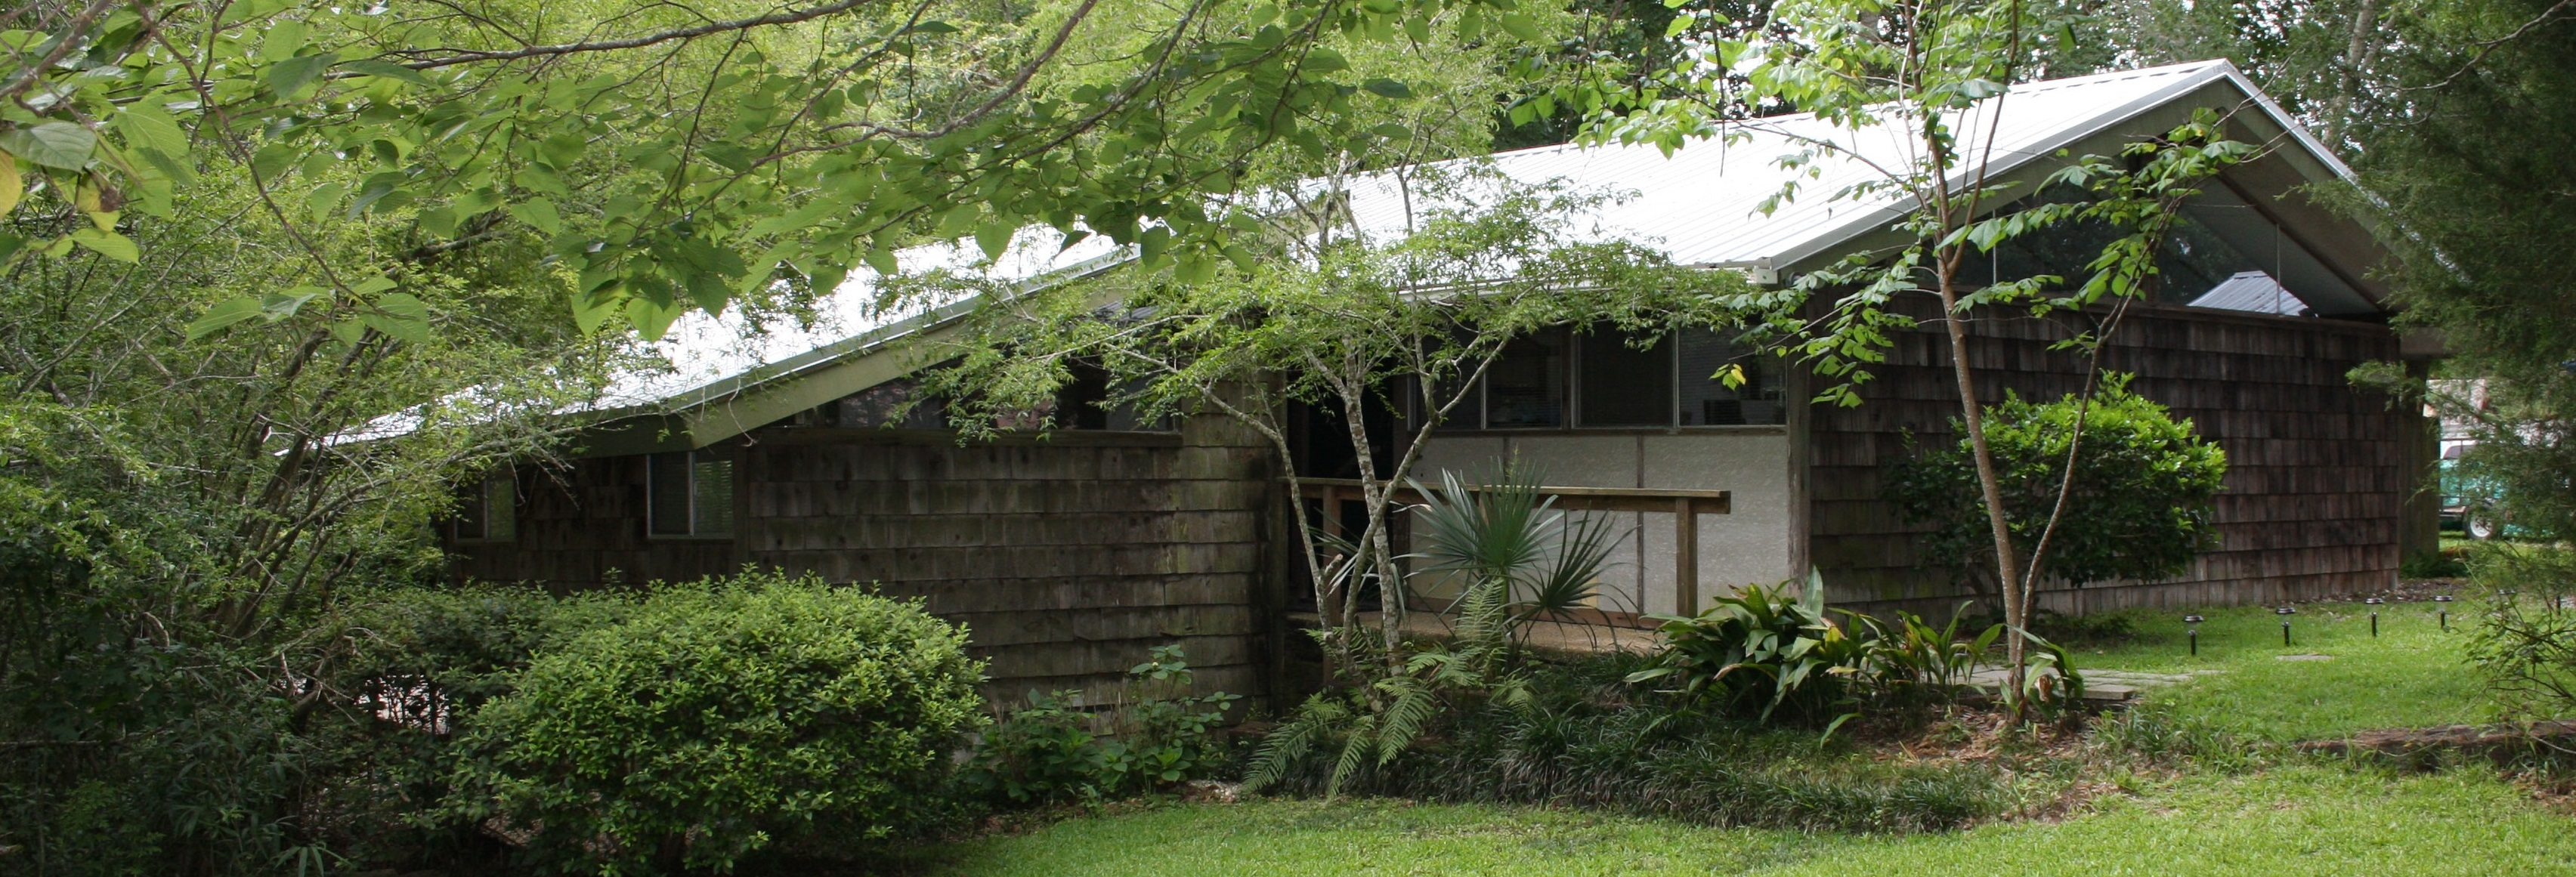 Ishee House